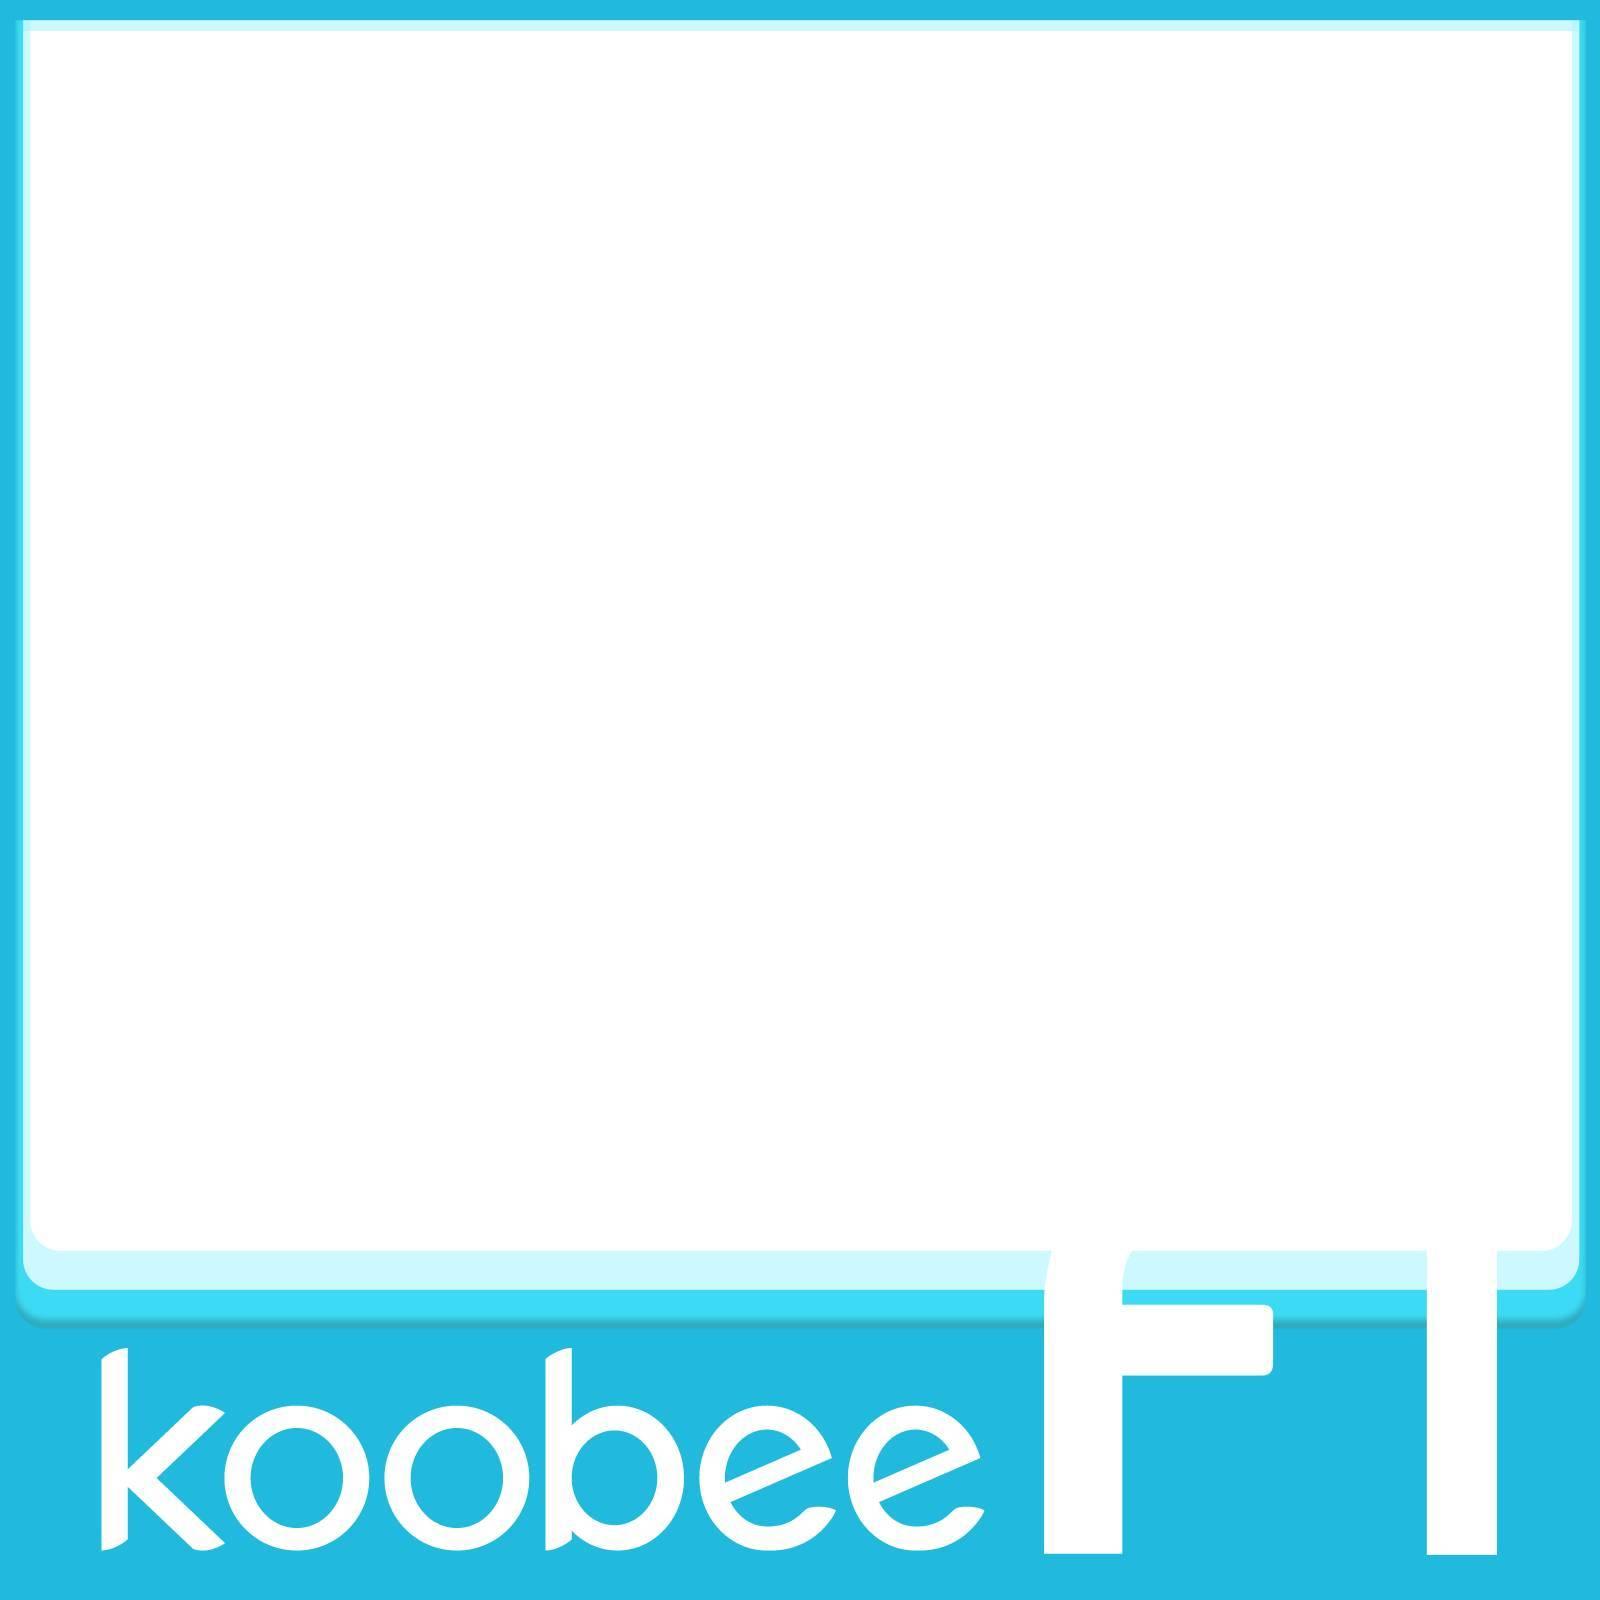 ppt 背景 背景图片 边框 模板 设计 矢量 矢量图 素材 相框 1600_1600